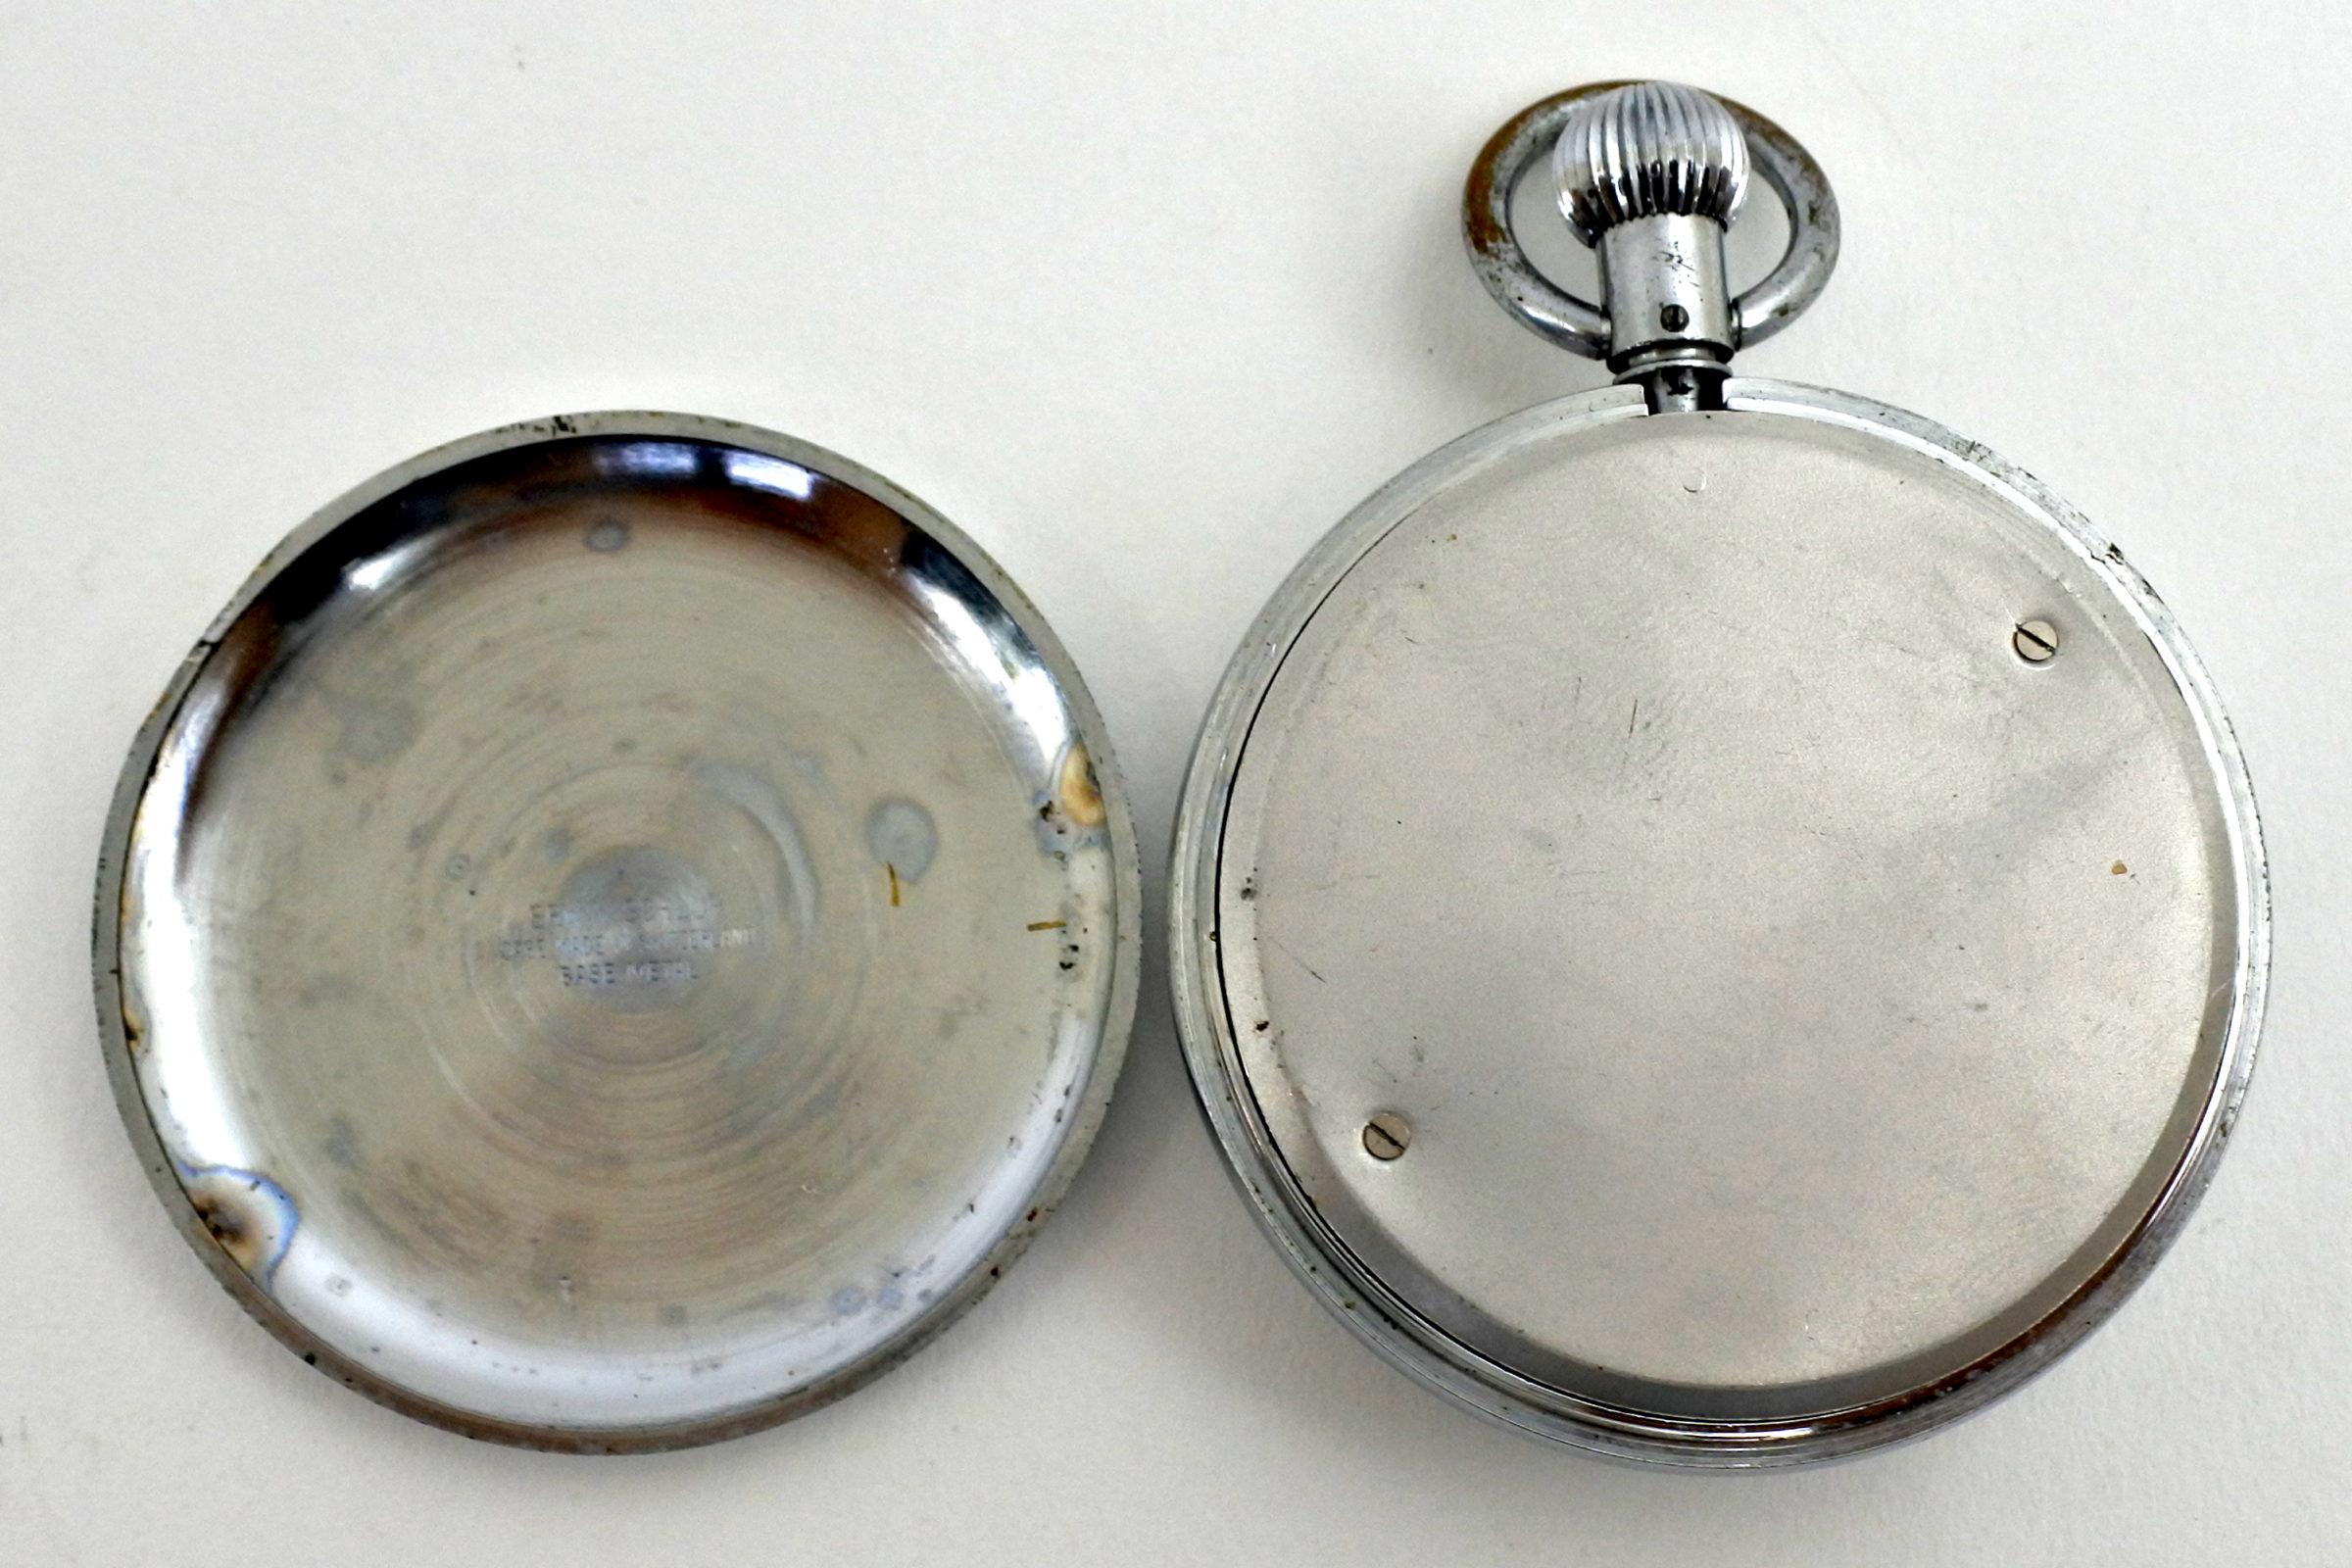 Cronometro Herwins - 2